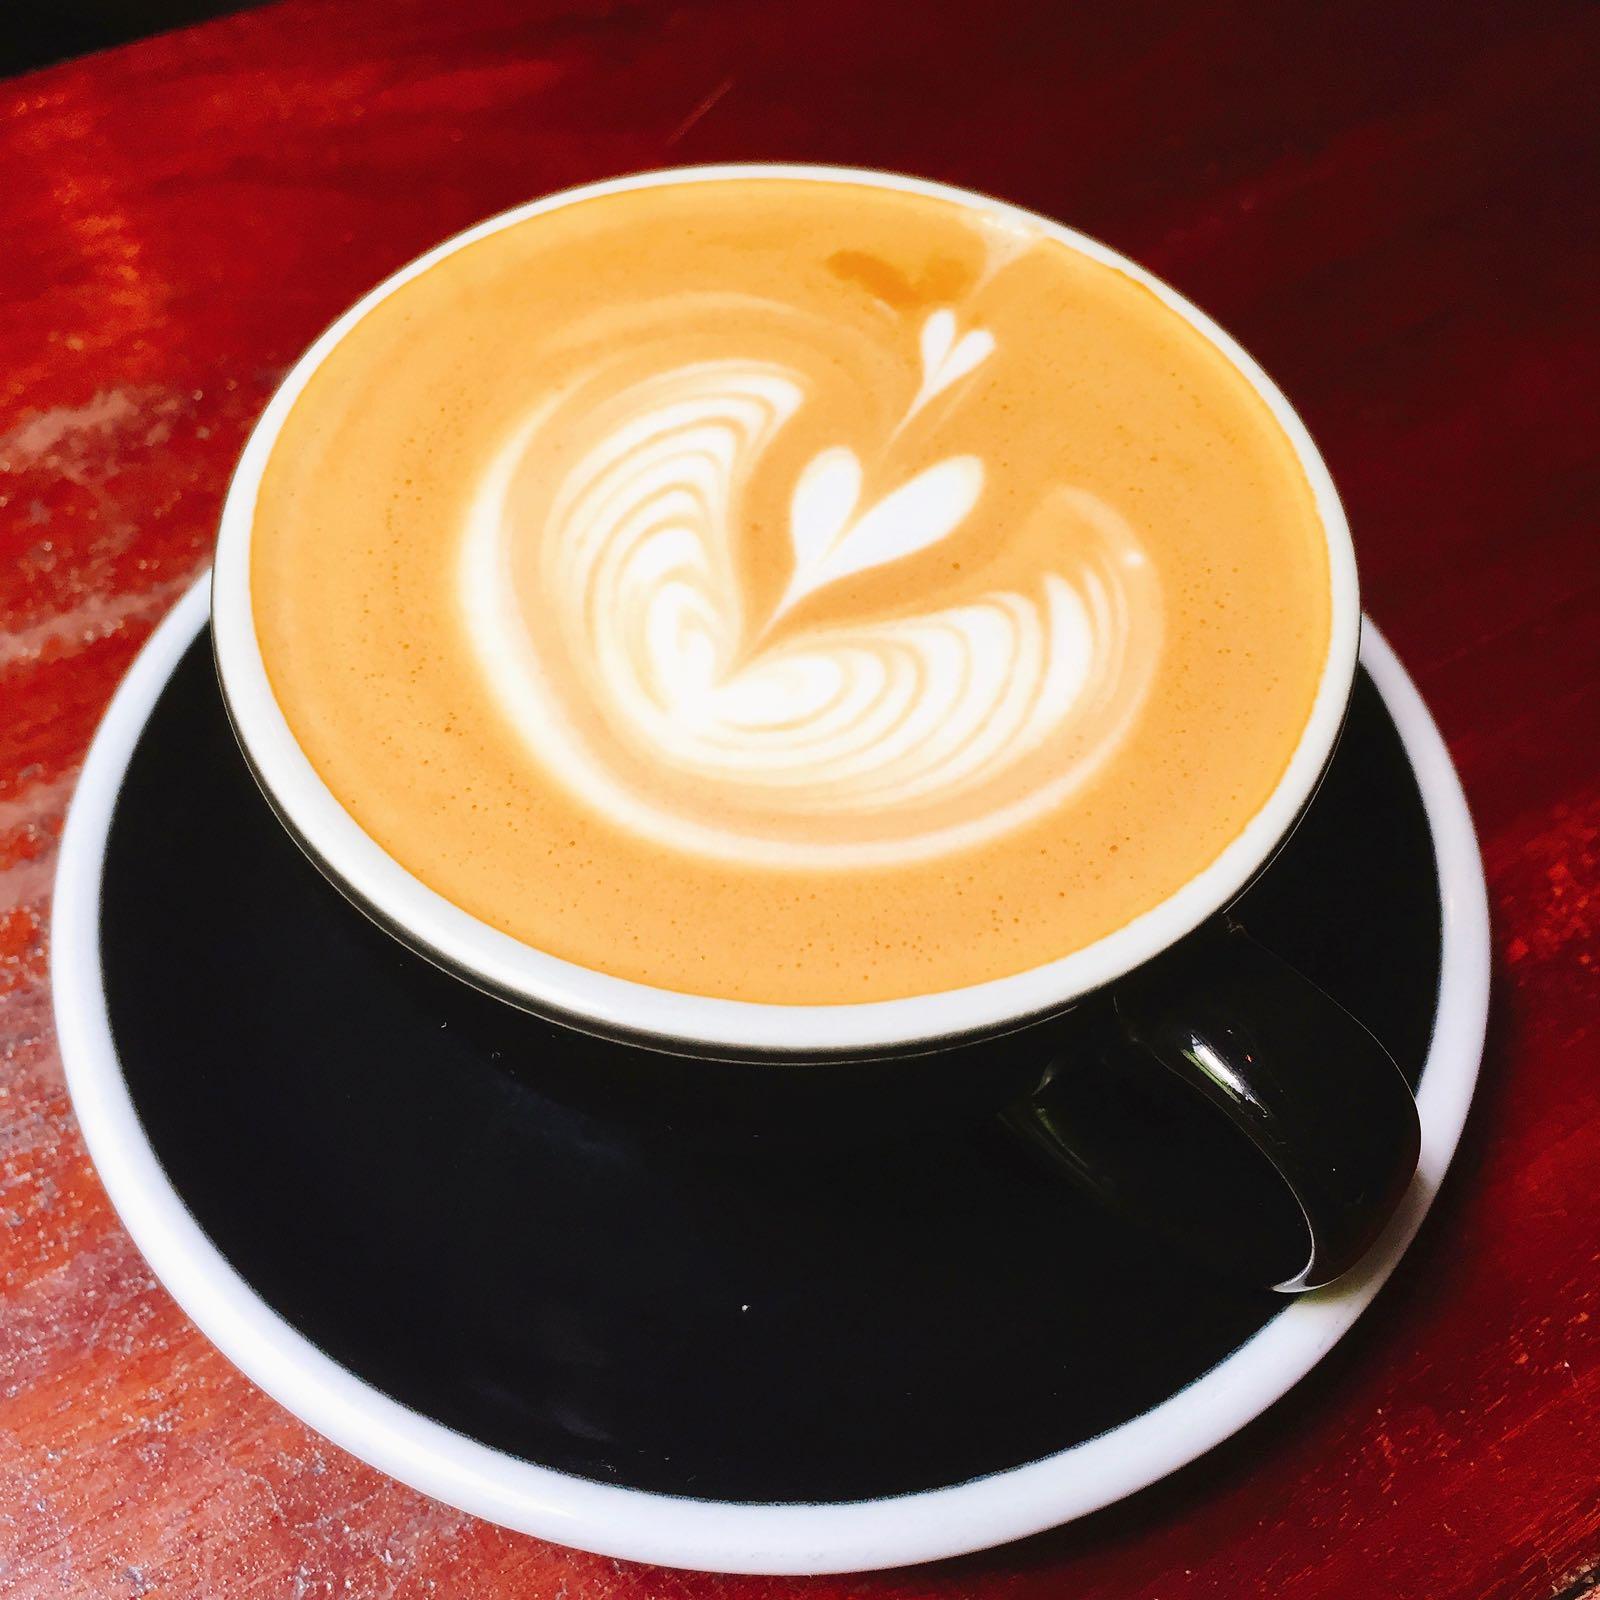 Coffee at VCR Cafe Kuala Lumpur